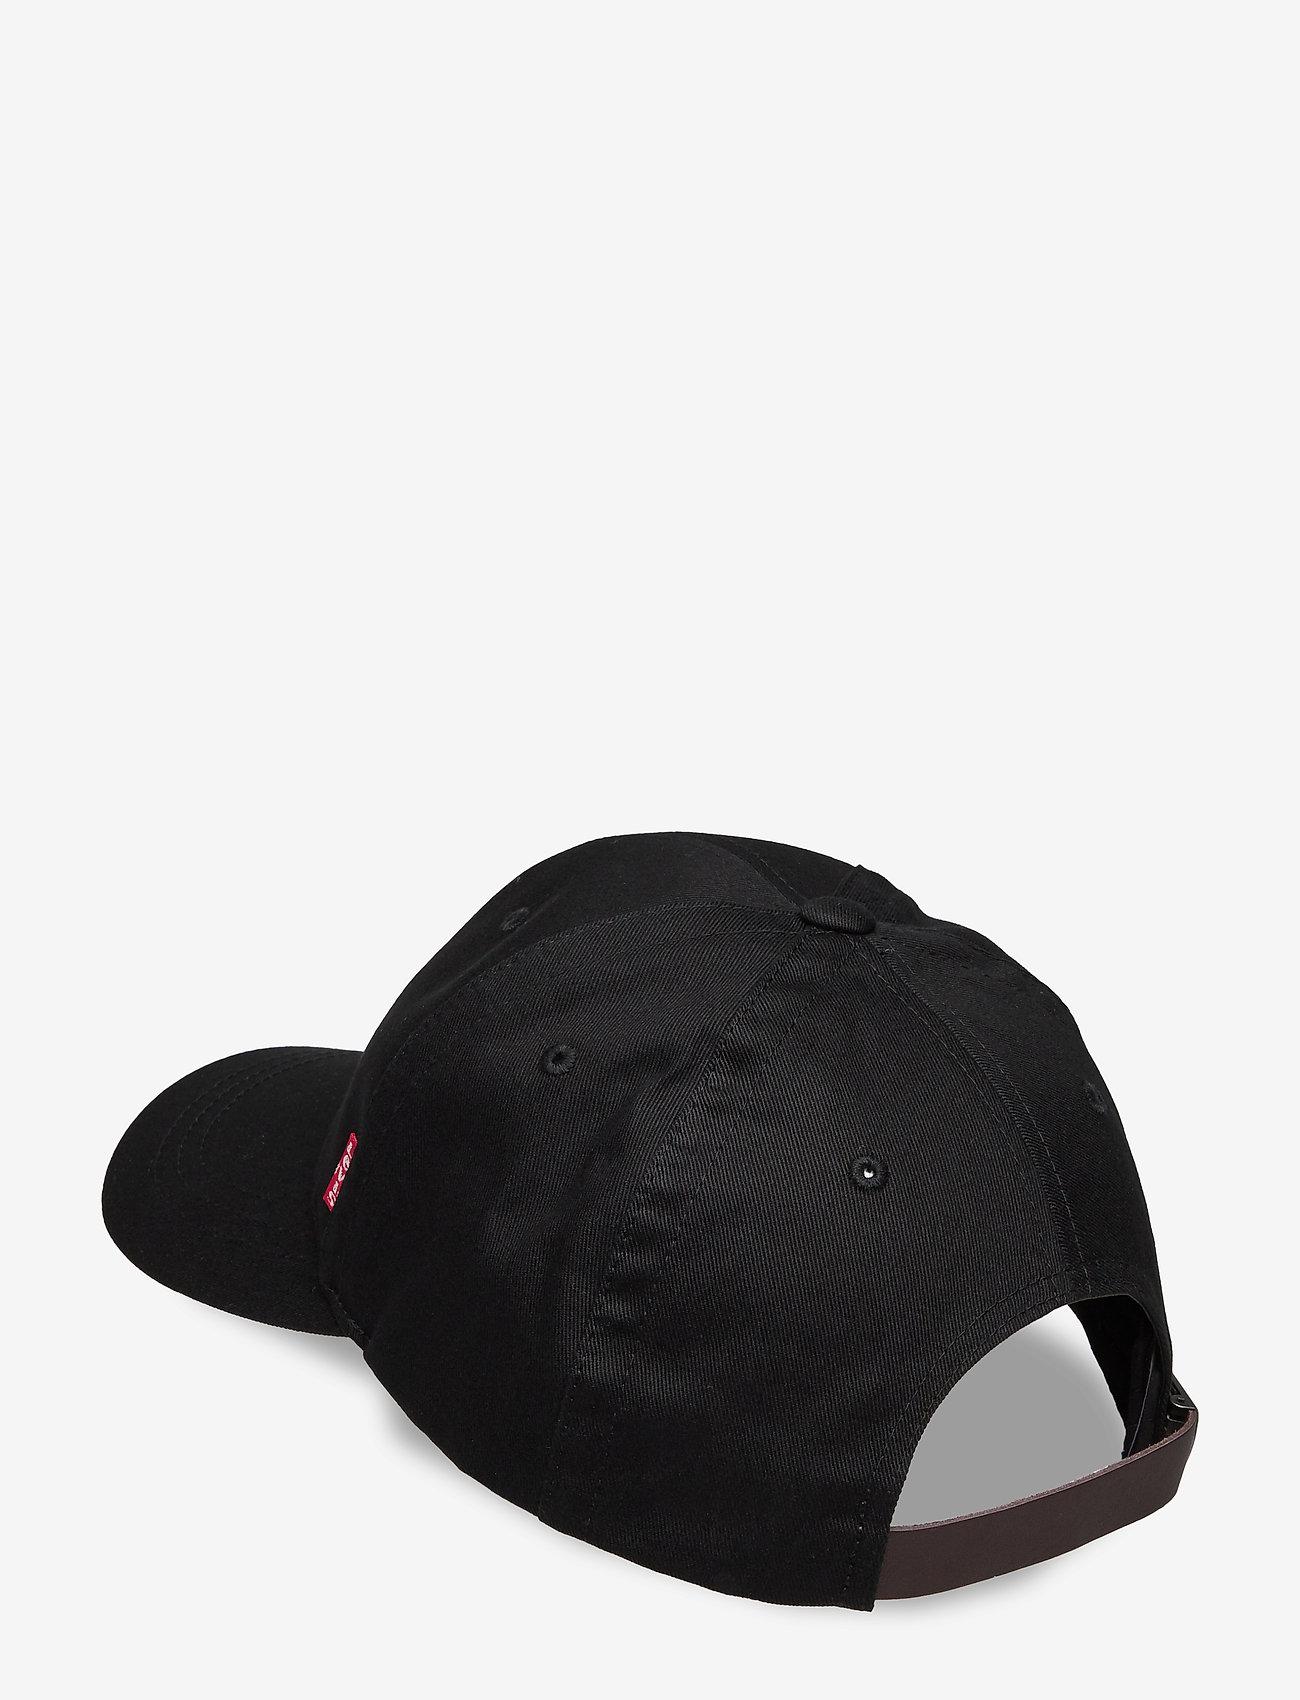 Levi's Footwear & Acc - CLASSIC TWILL RED TAB BASEBALL CAP - kepsar - regular black - 1